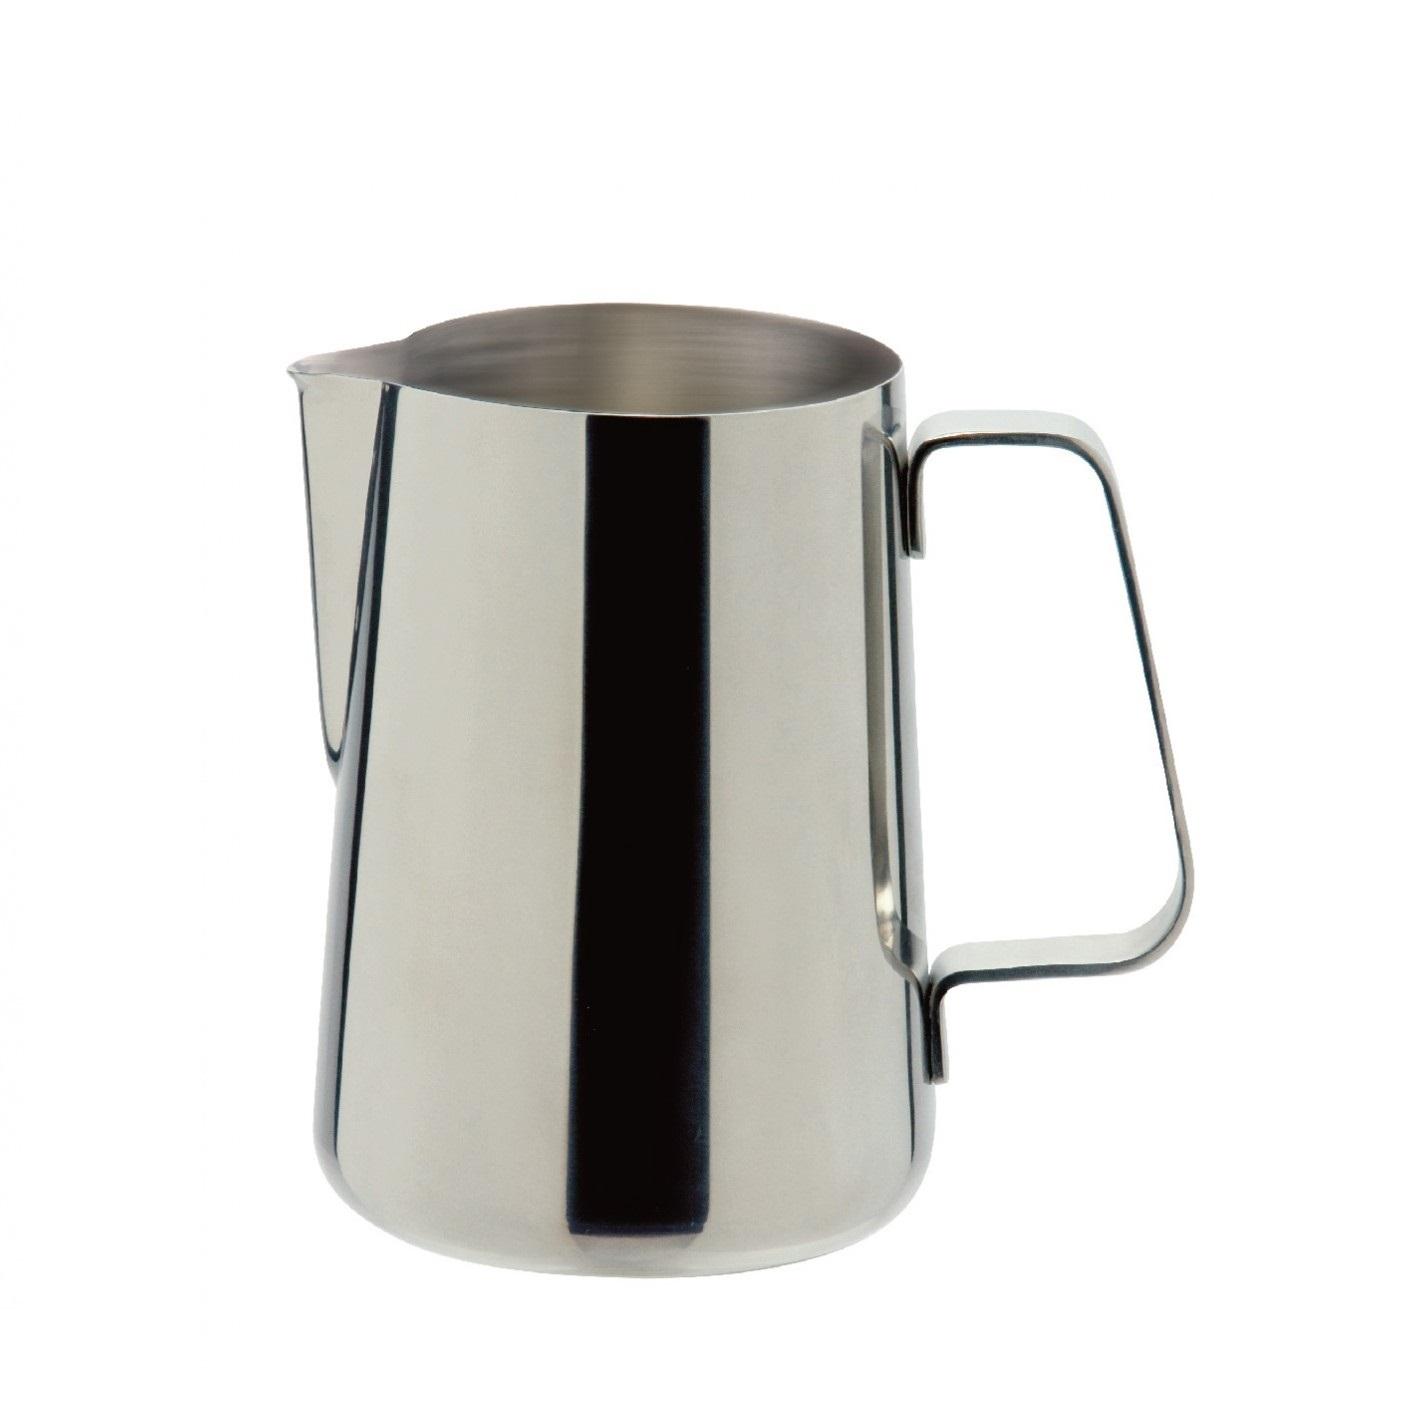 Lattiera Easy din inox pentru cappuccino 600ml 620251